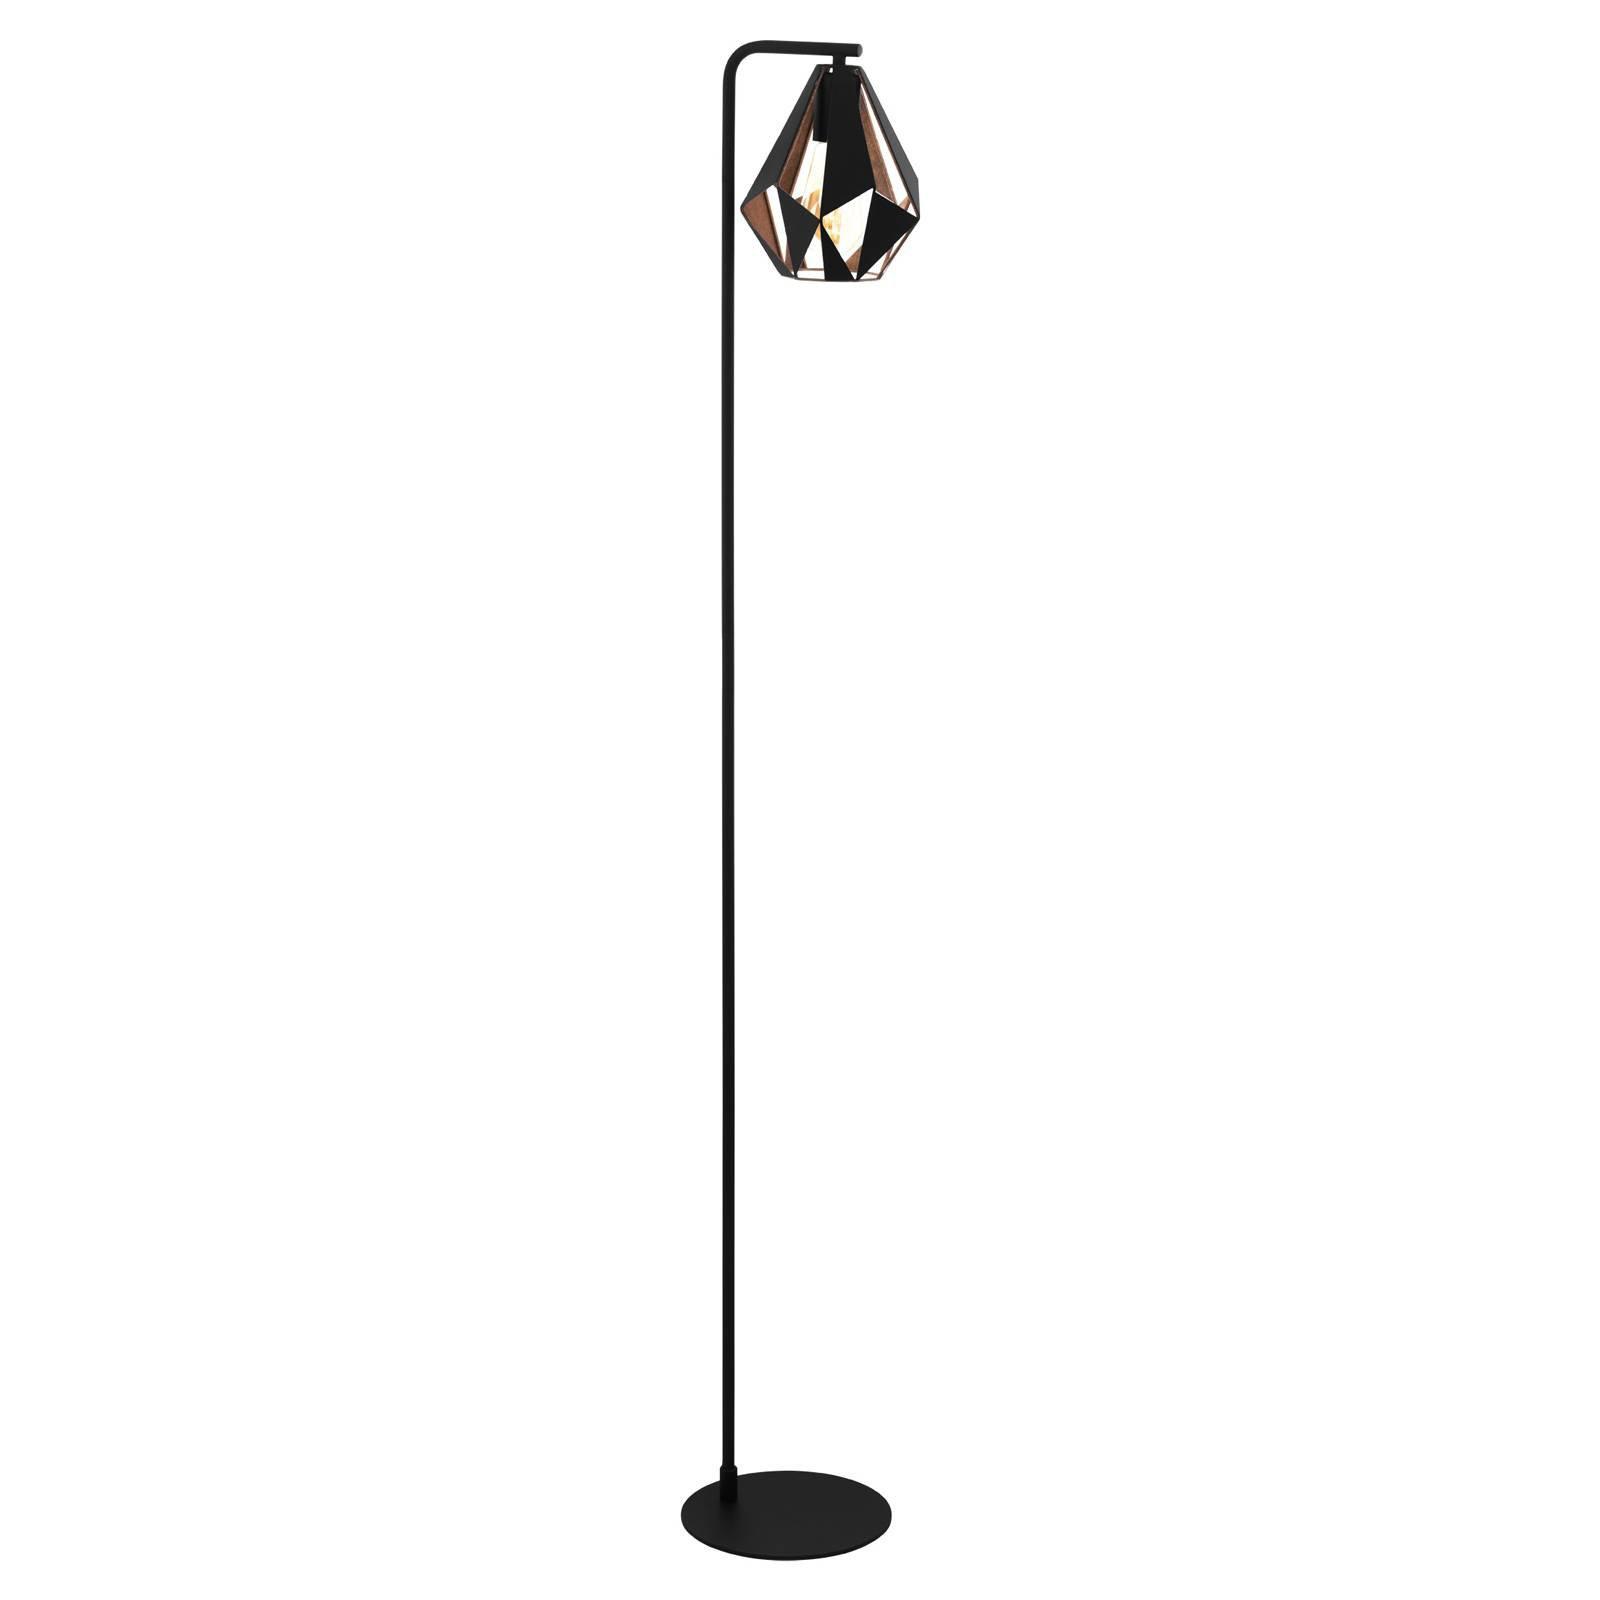 Gulvlampe Carlton 4 i svart/kobber